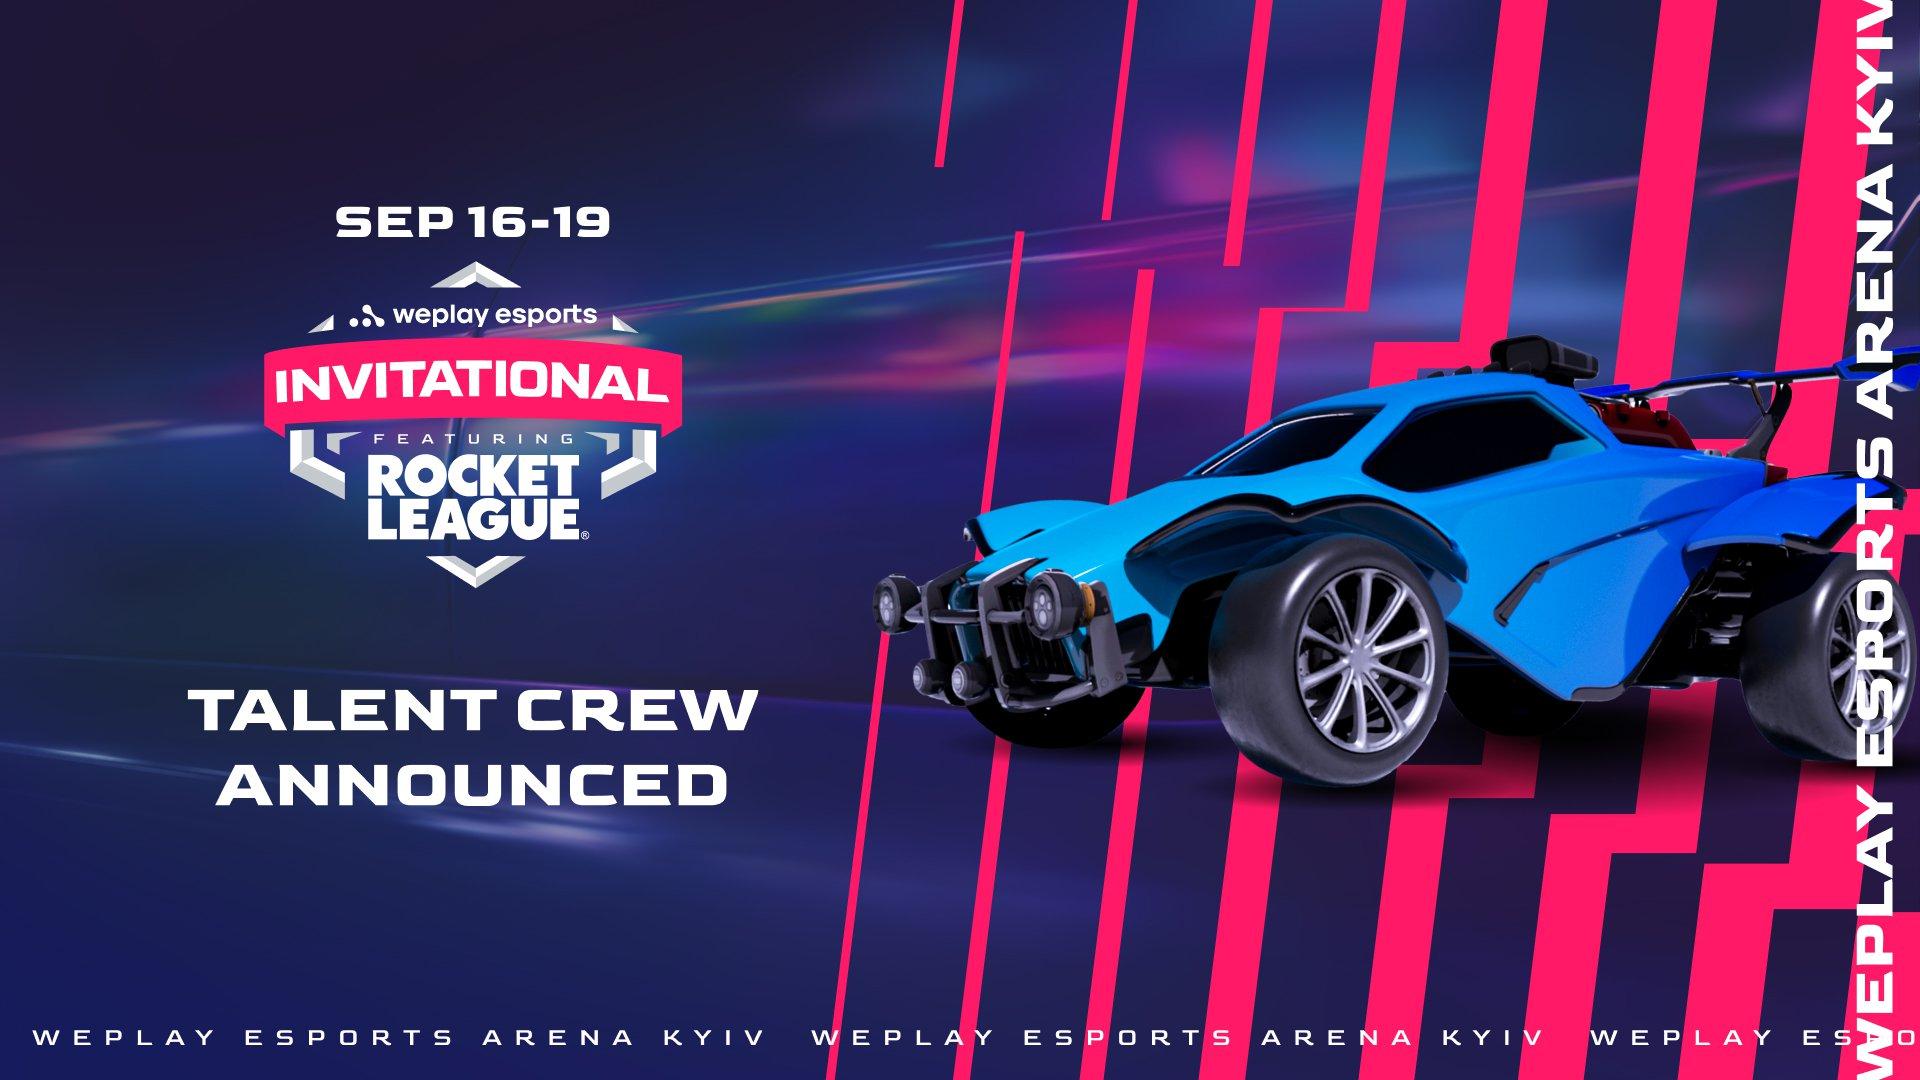 WePlay Esports Invitational talent crew. Visual: WePlay Holding